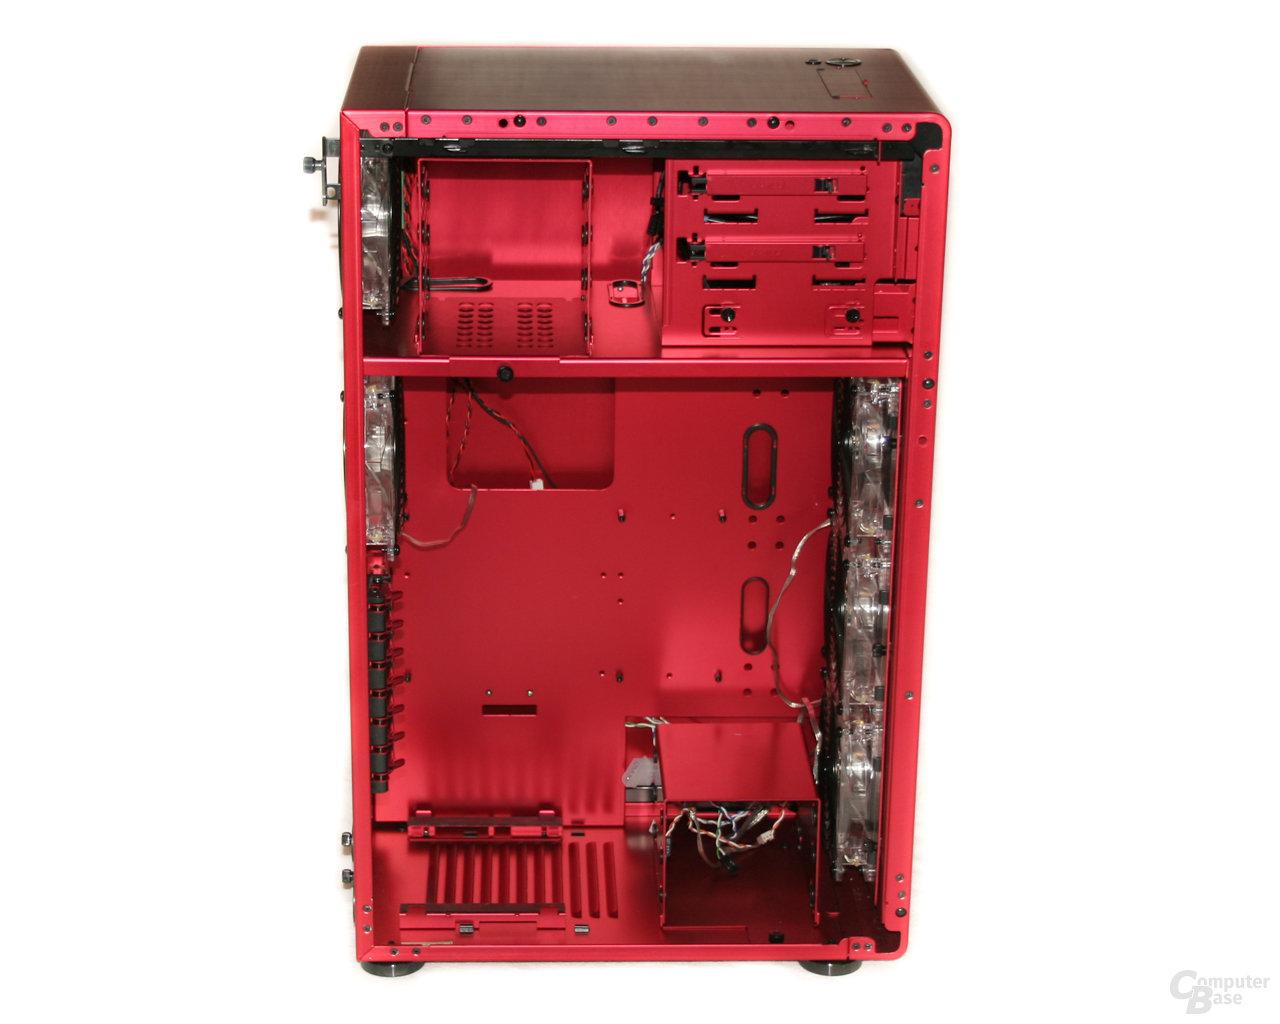 Lian Li PC-X900R – Innenansicht